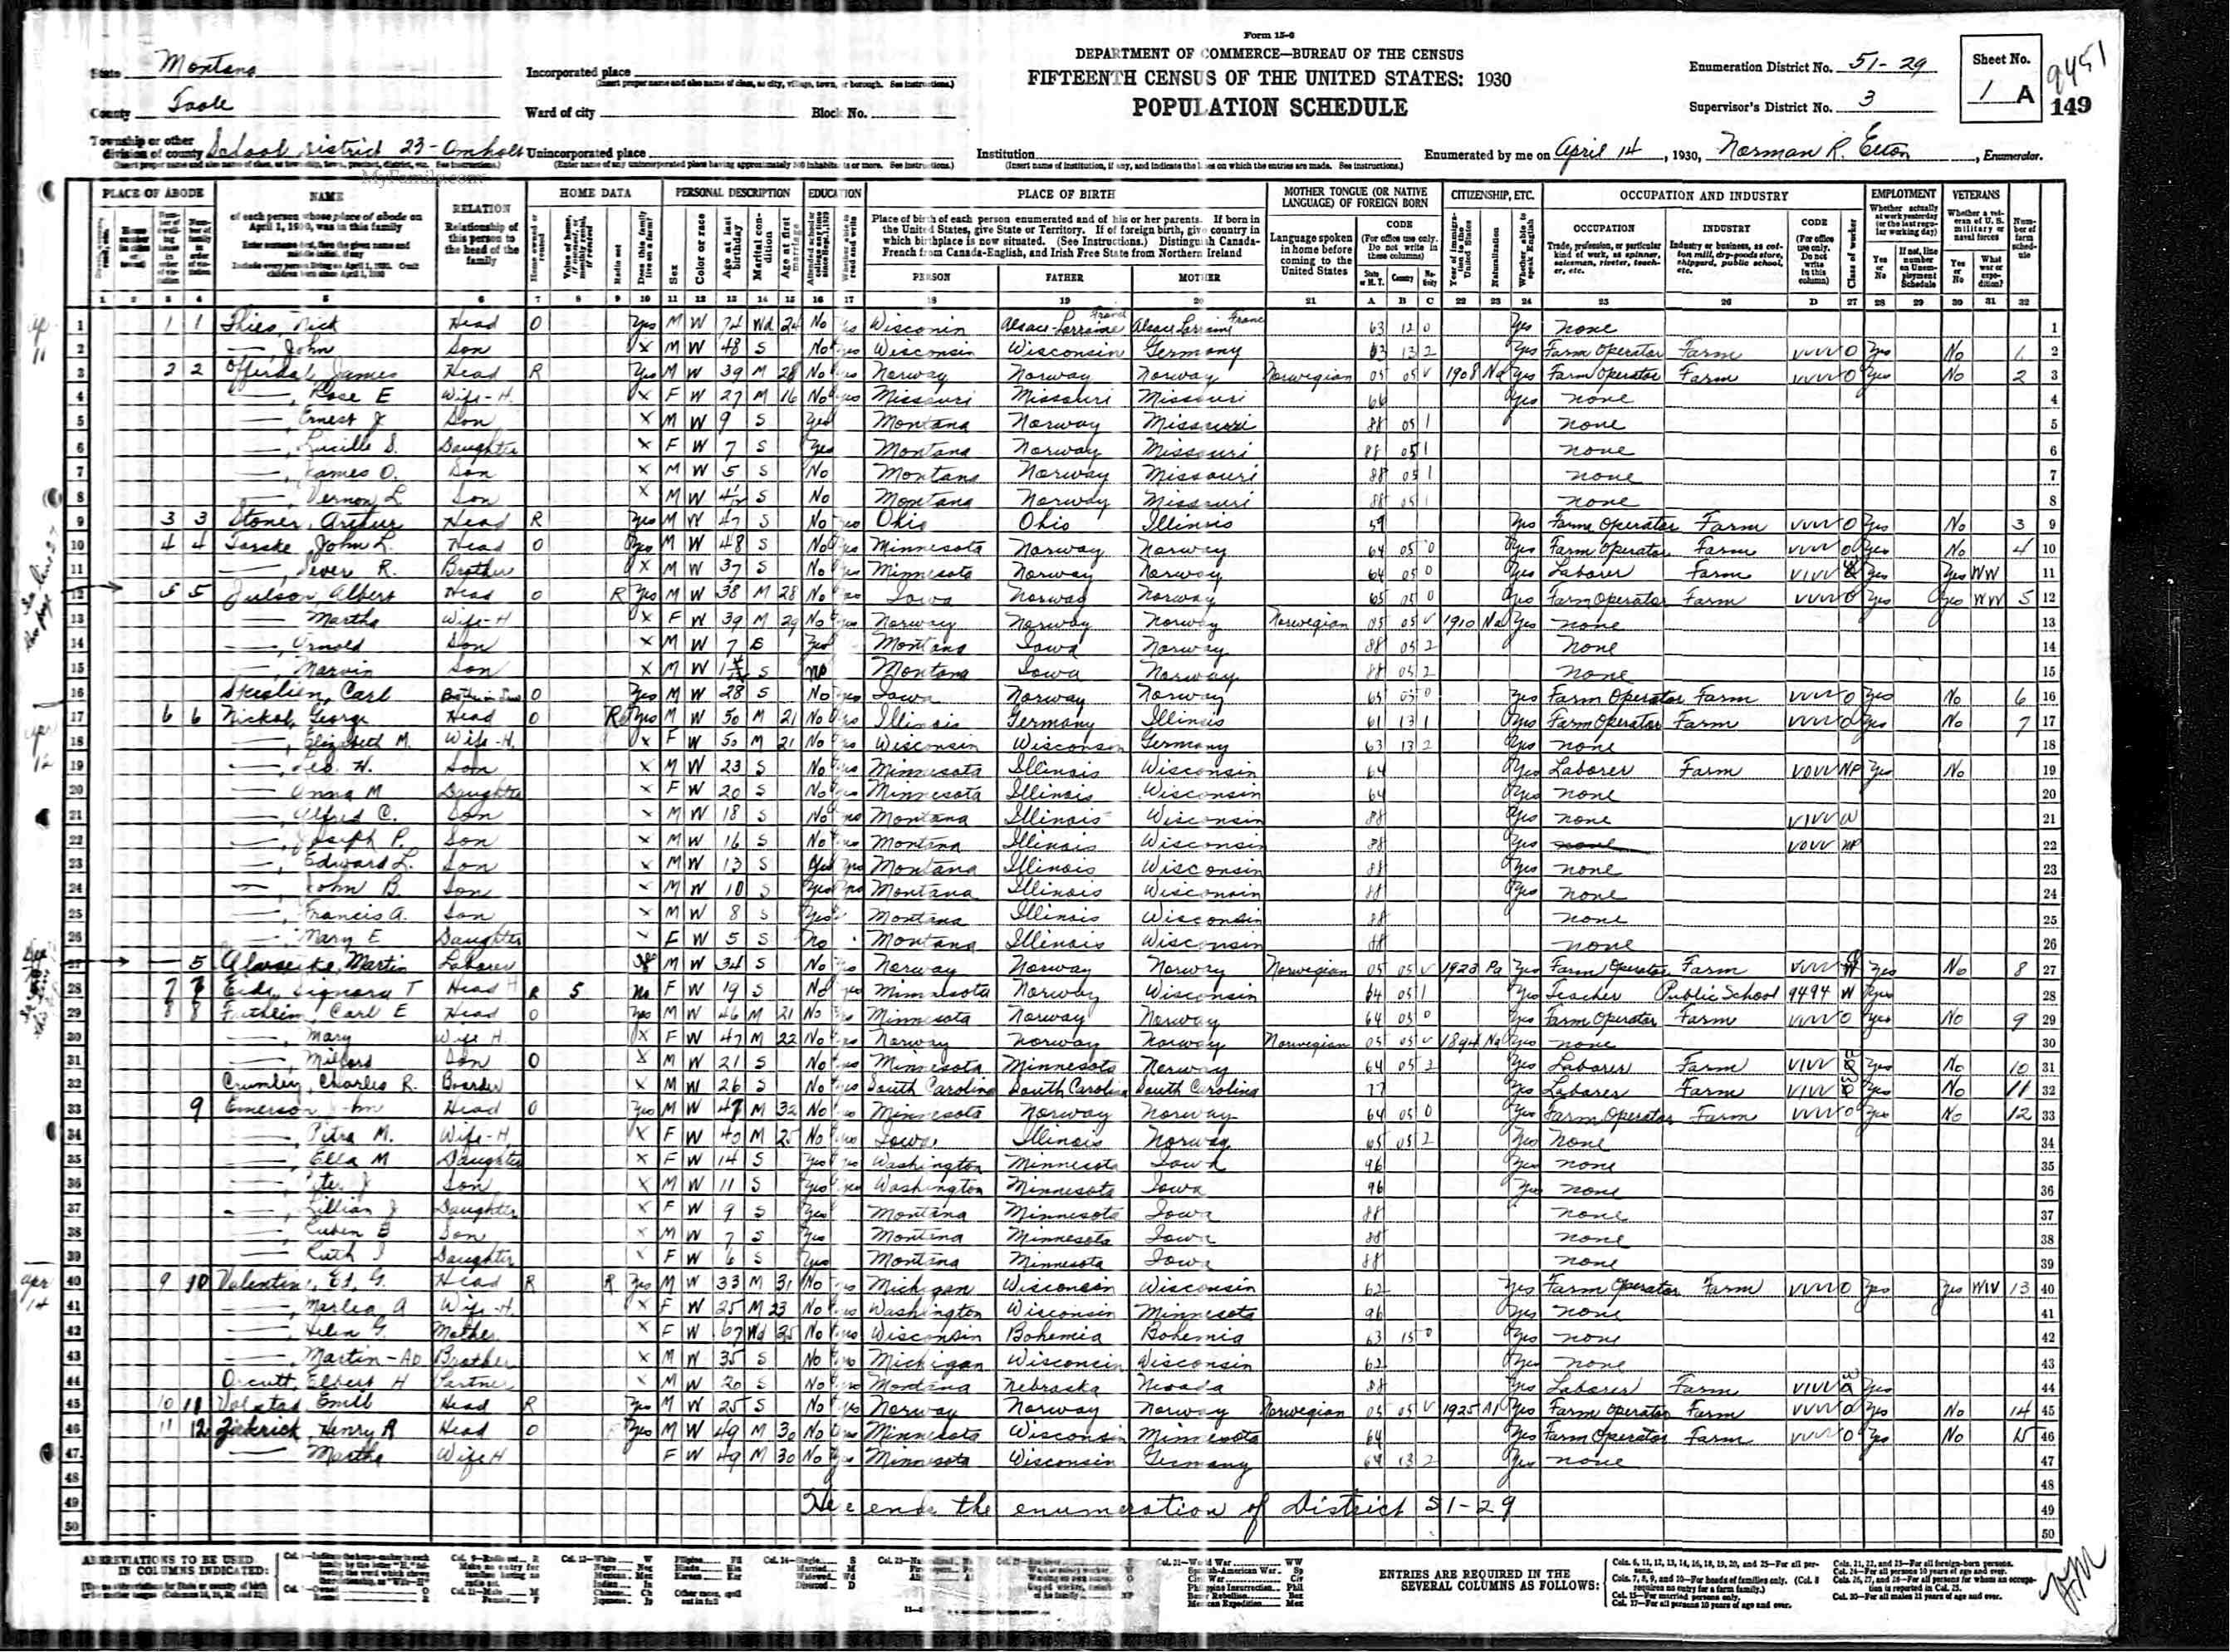 Montana pondera county ledger -  Pondera County Montana Marlea Valentine 1930 Census District 23 Toole County Montana